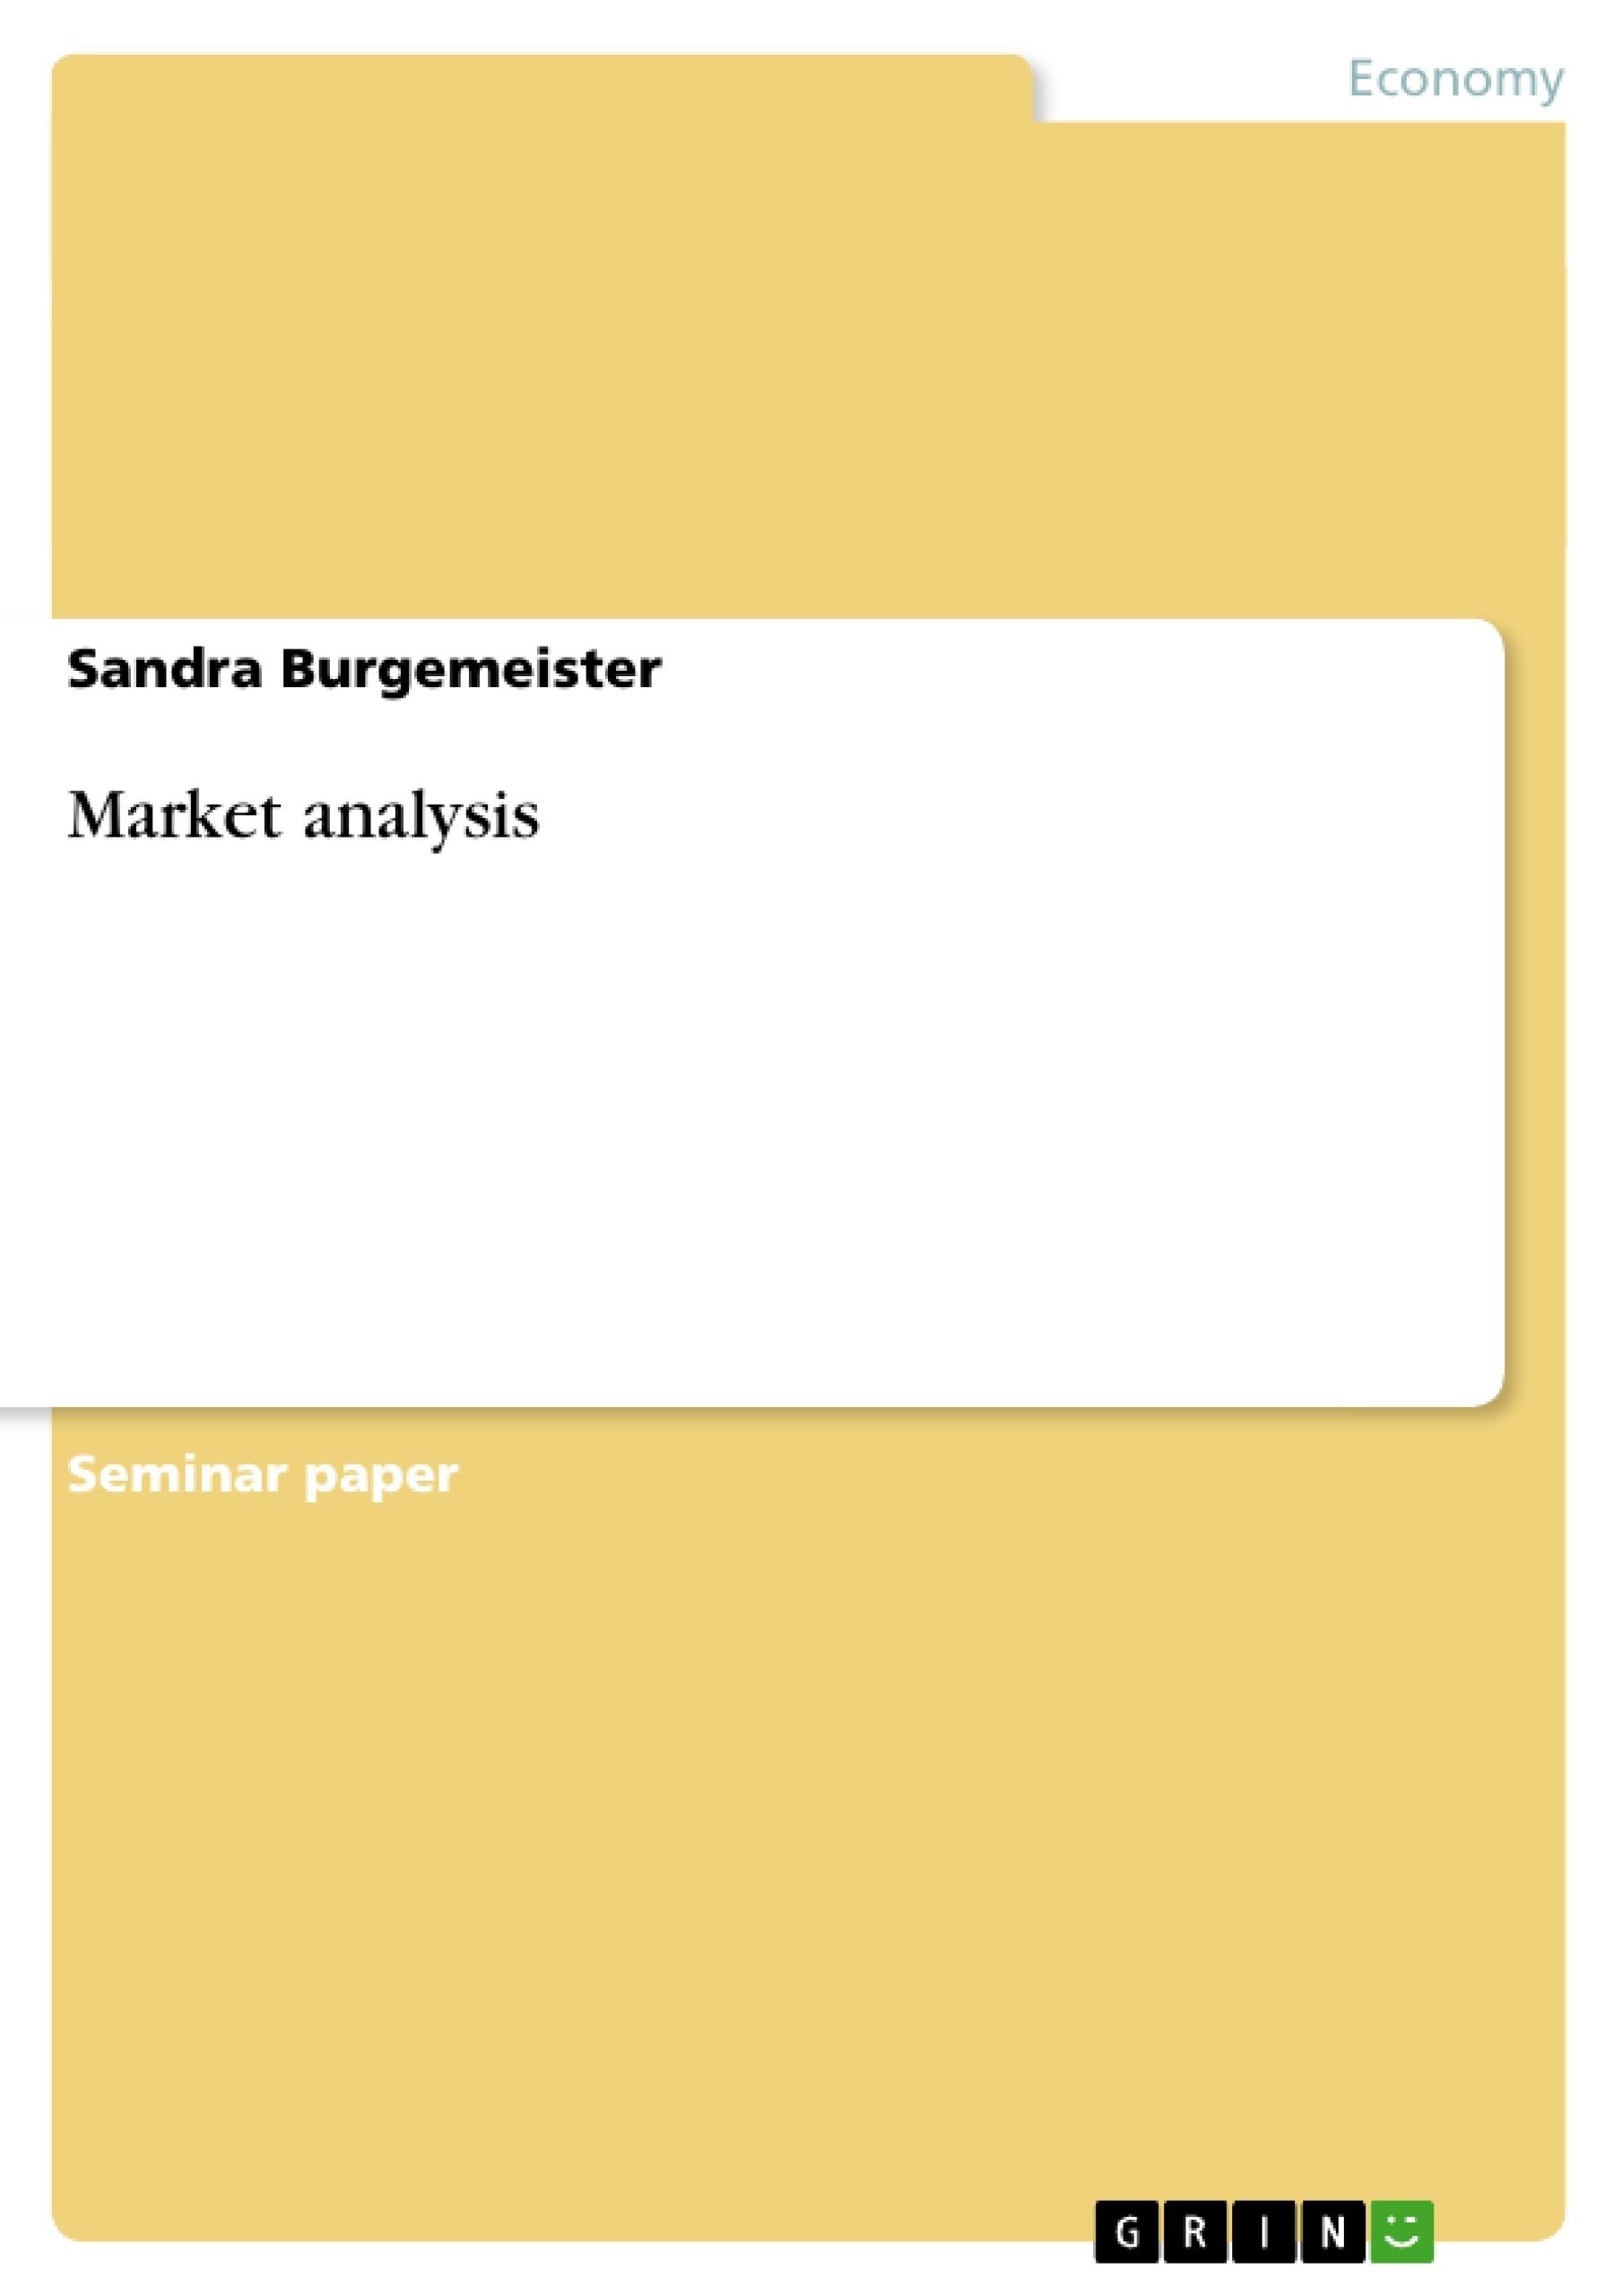 Title: Market analysis